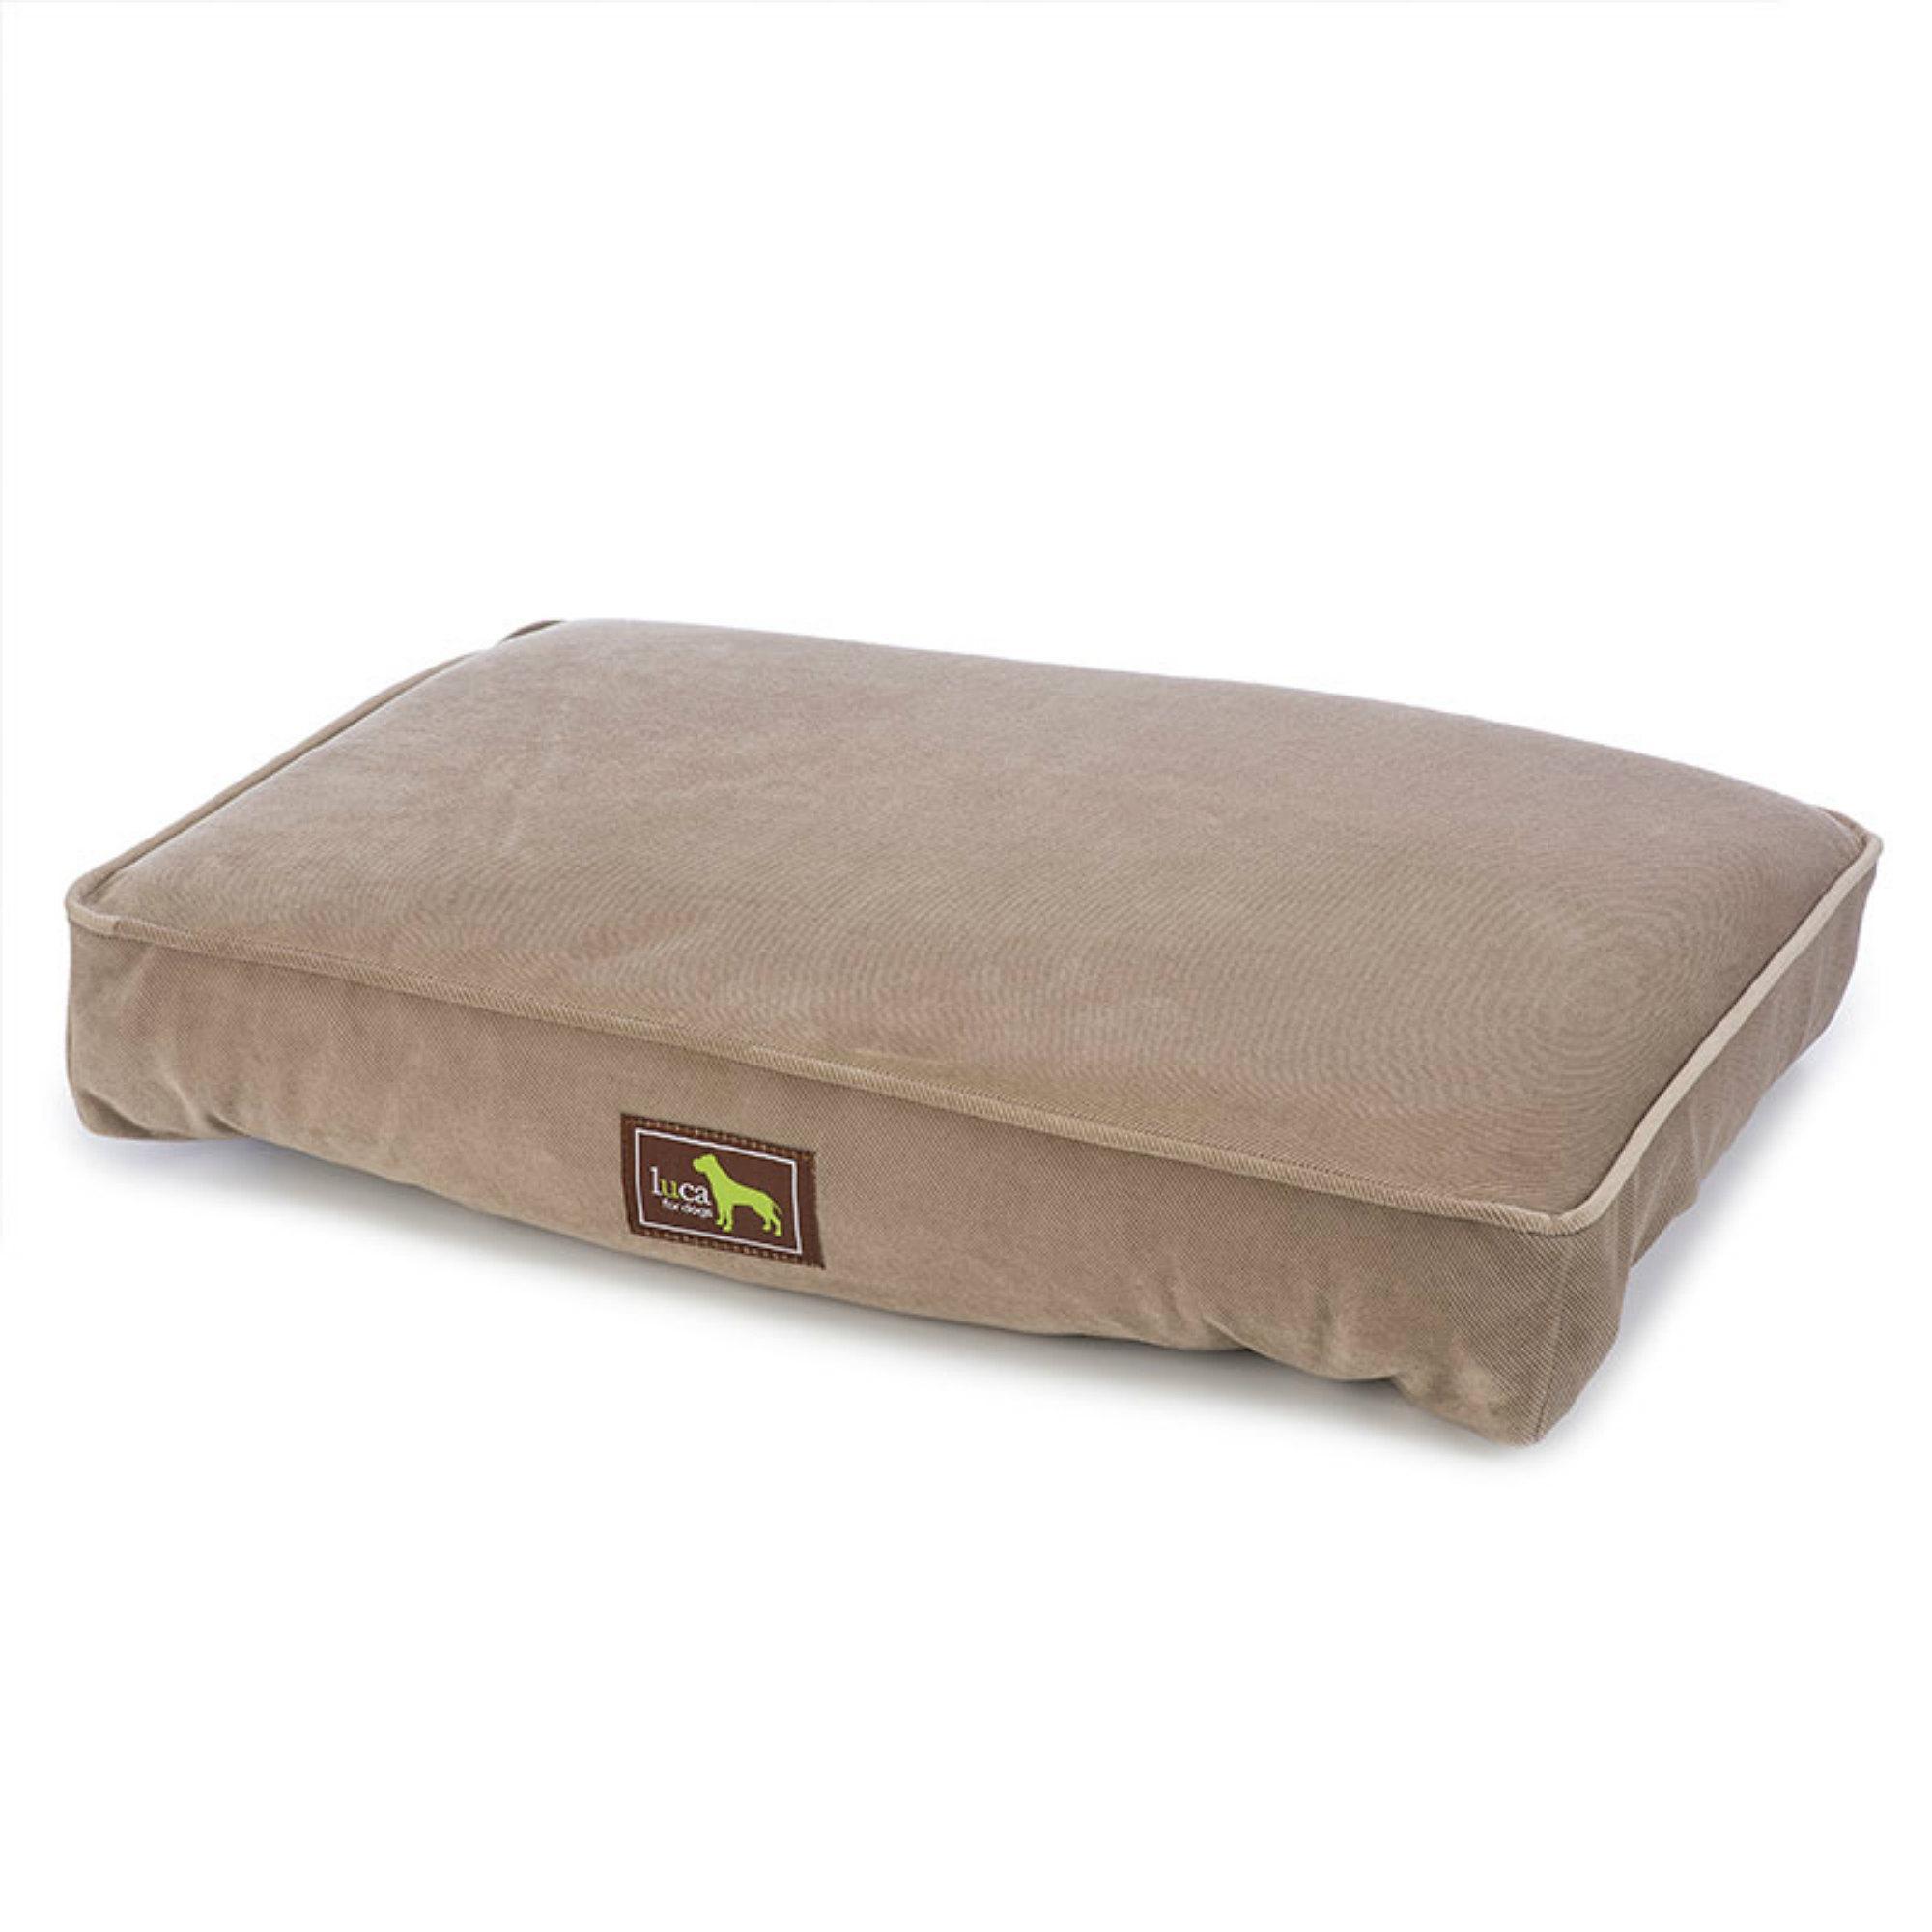 Luca Orthopedic Dog Bed - Sand